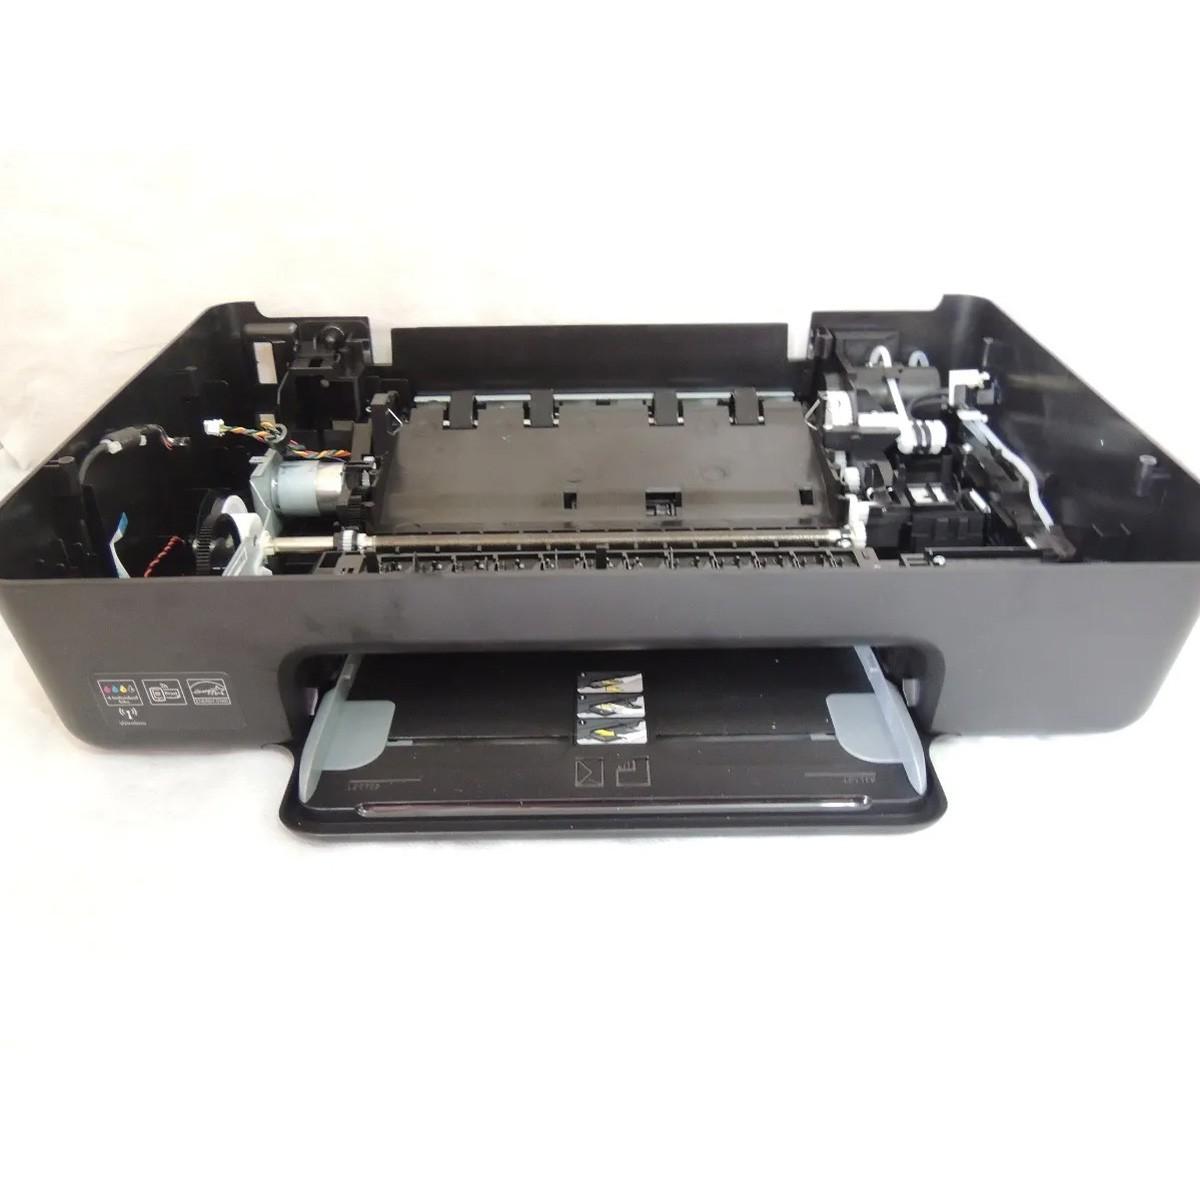 Carcaça Base C/ Mecânismo Completo Impressora HP Deskjet Ink Advantage 4625 - Retirado